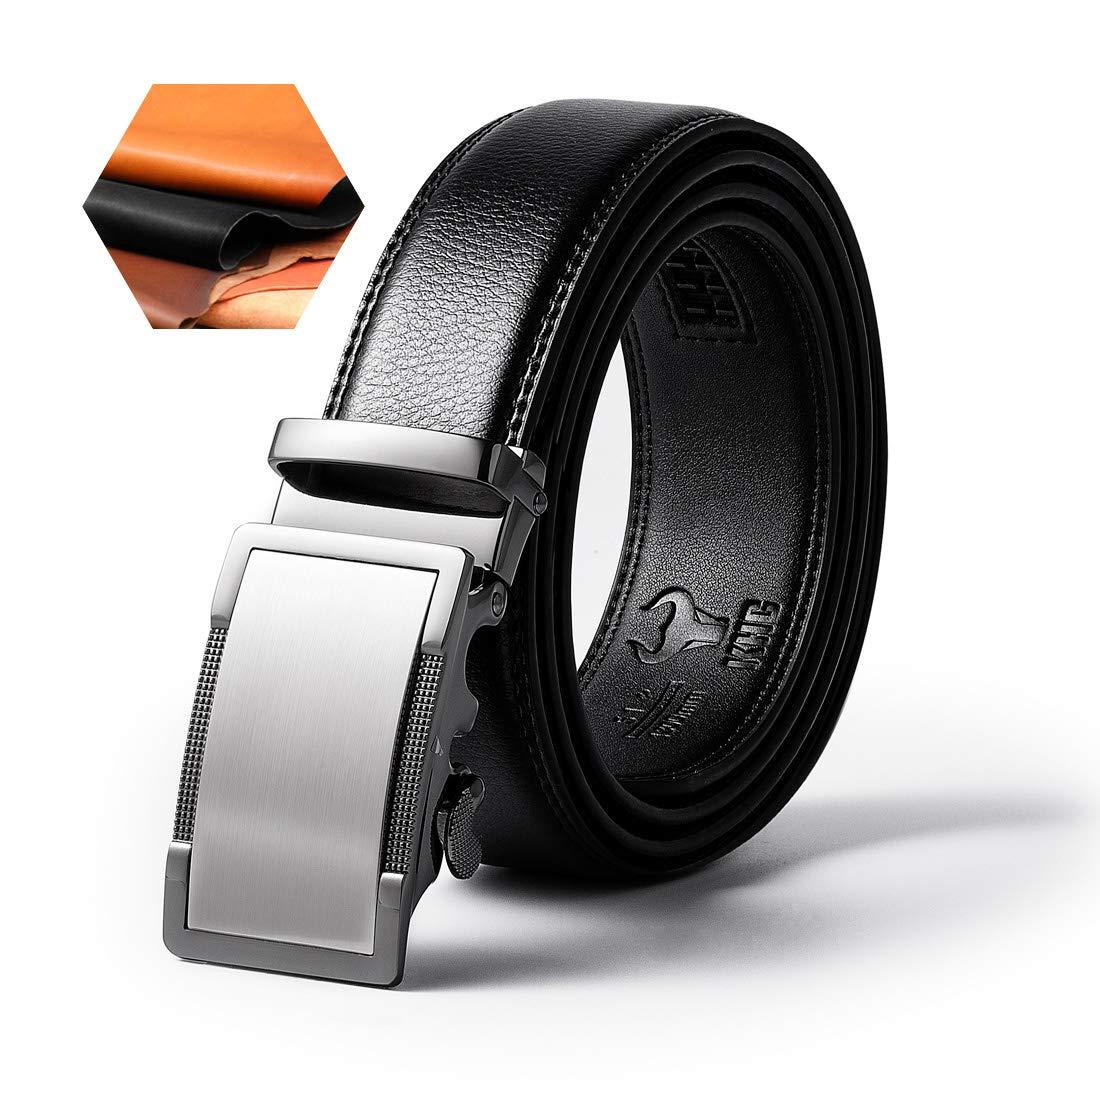 KHC Men's Belt High Quality Leather Ratchet Automatic Adjustable Buckle Black apparel-belts